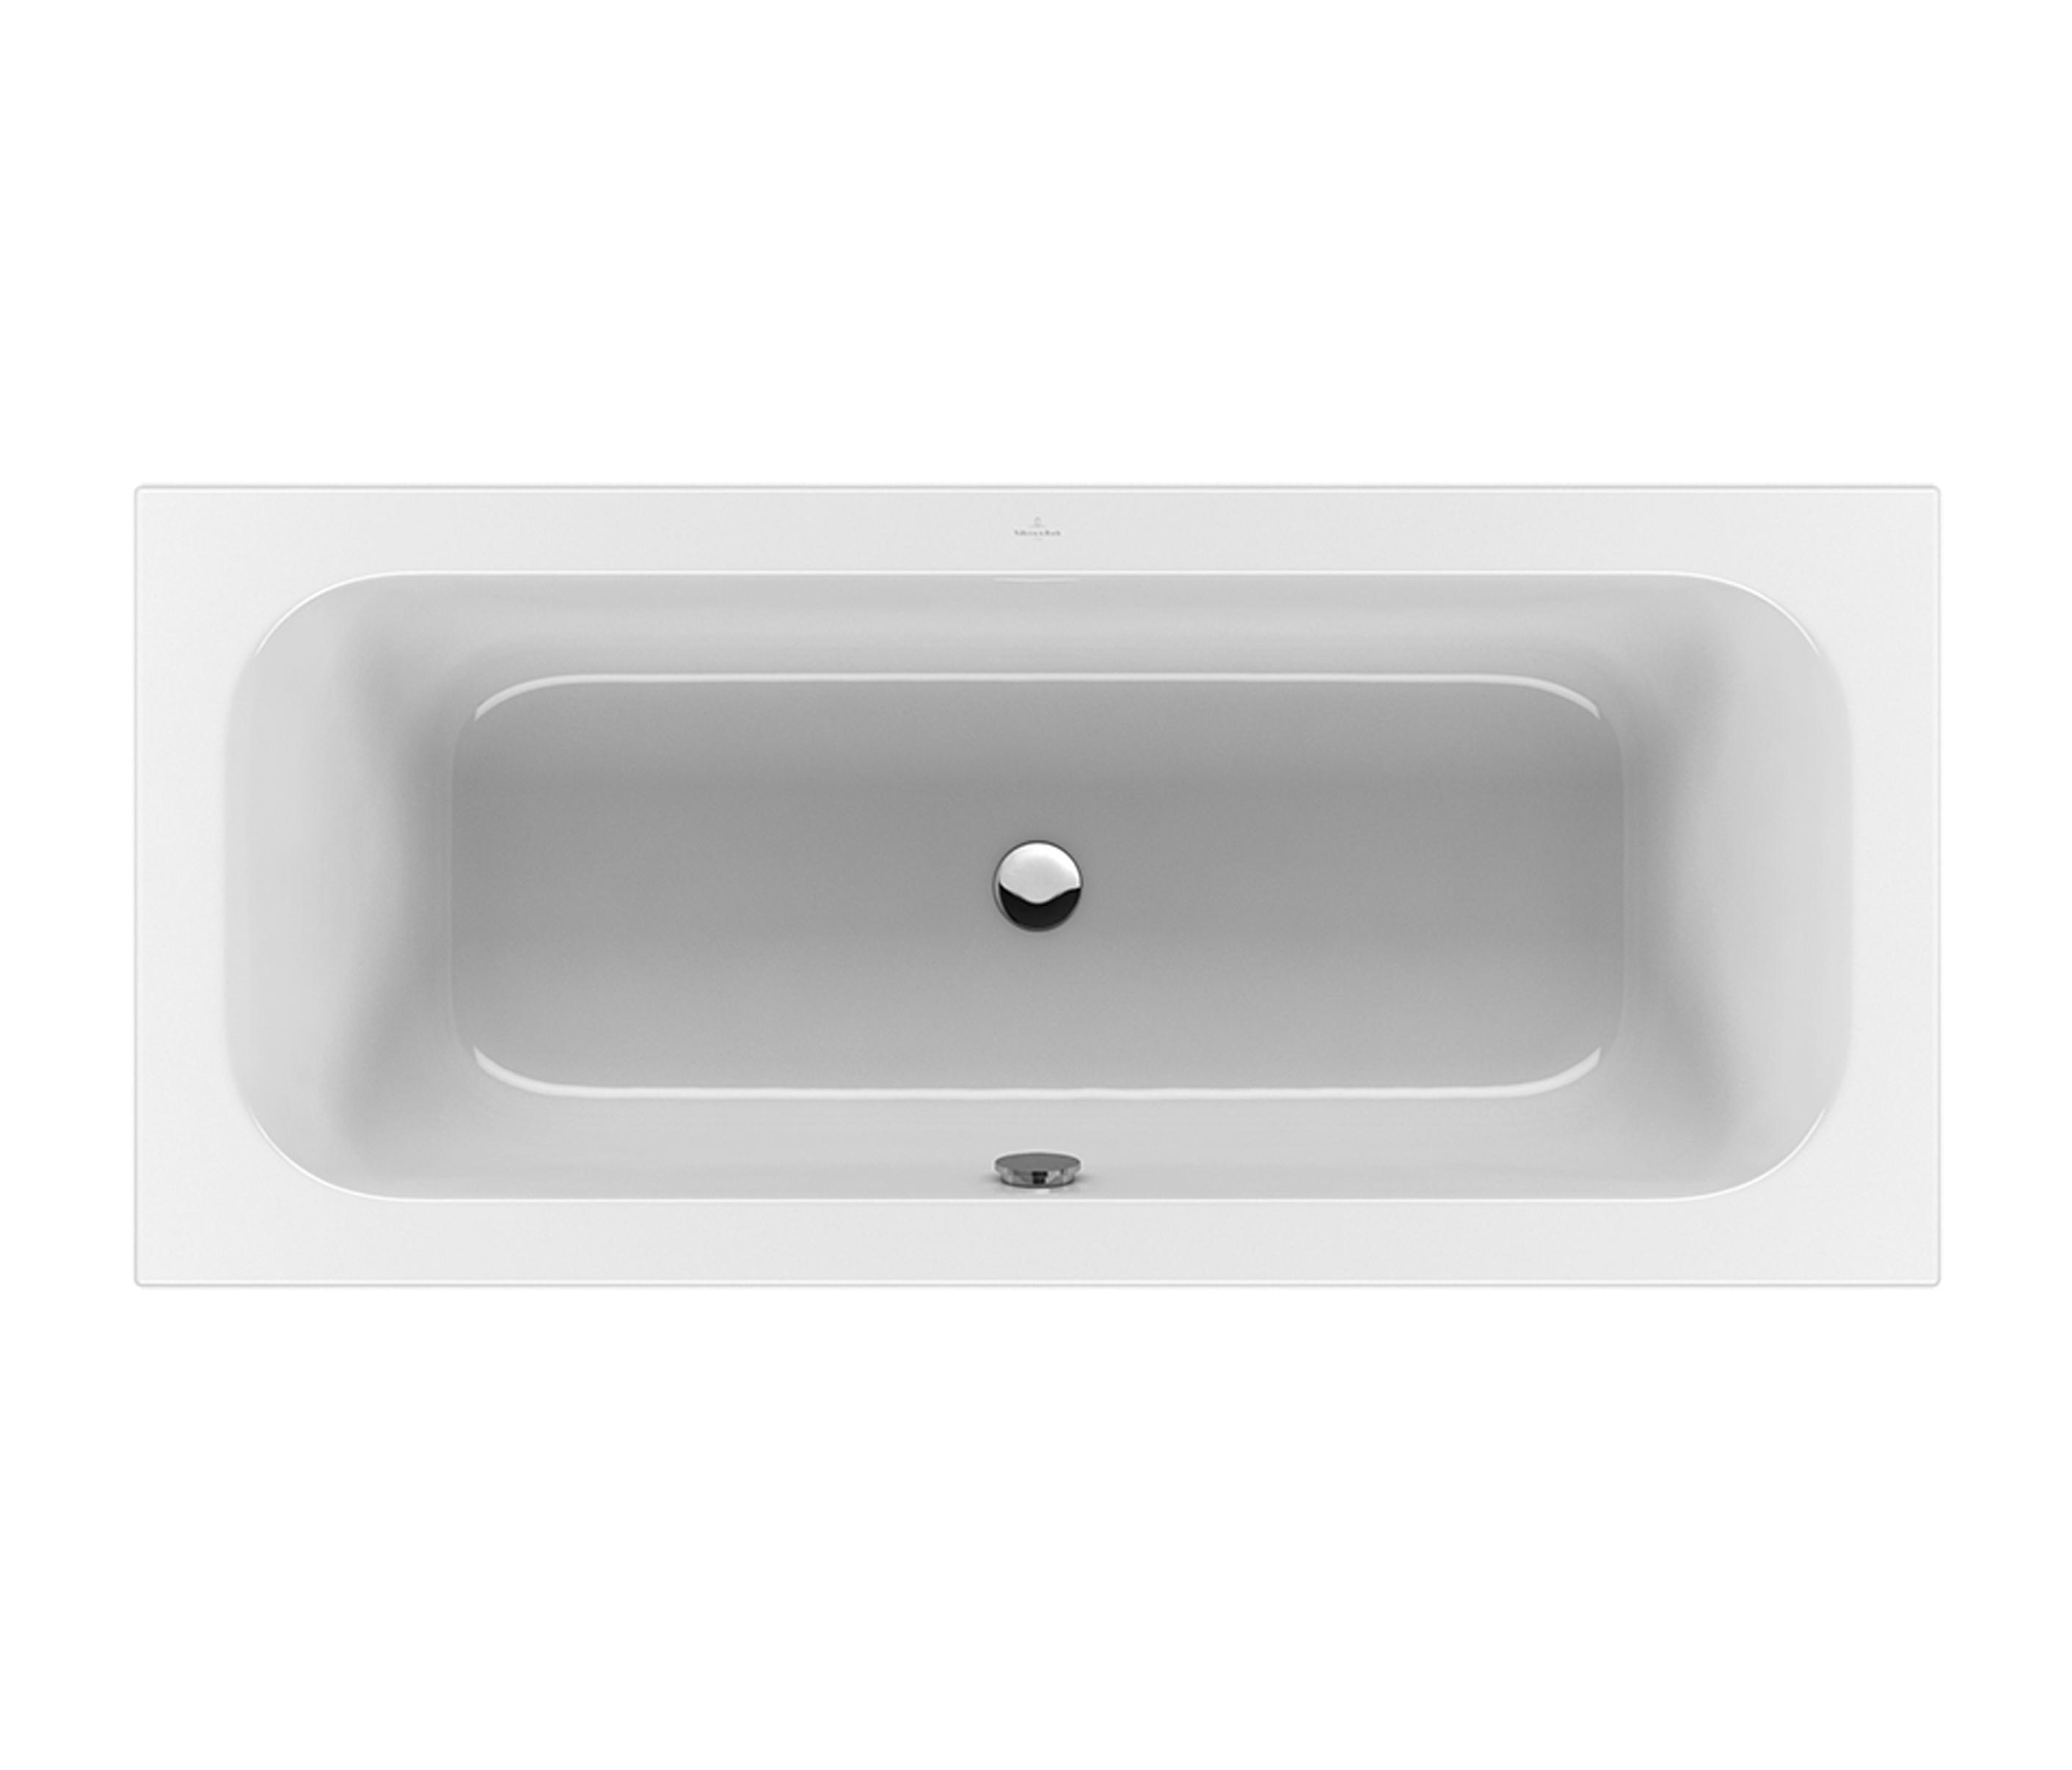 Loop friends vasca da bagno vasche ad incasso villeroy - Vasche da bagno ad incasso ...